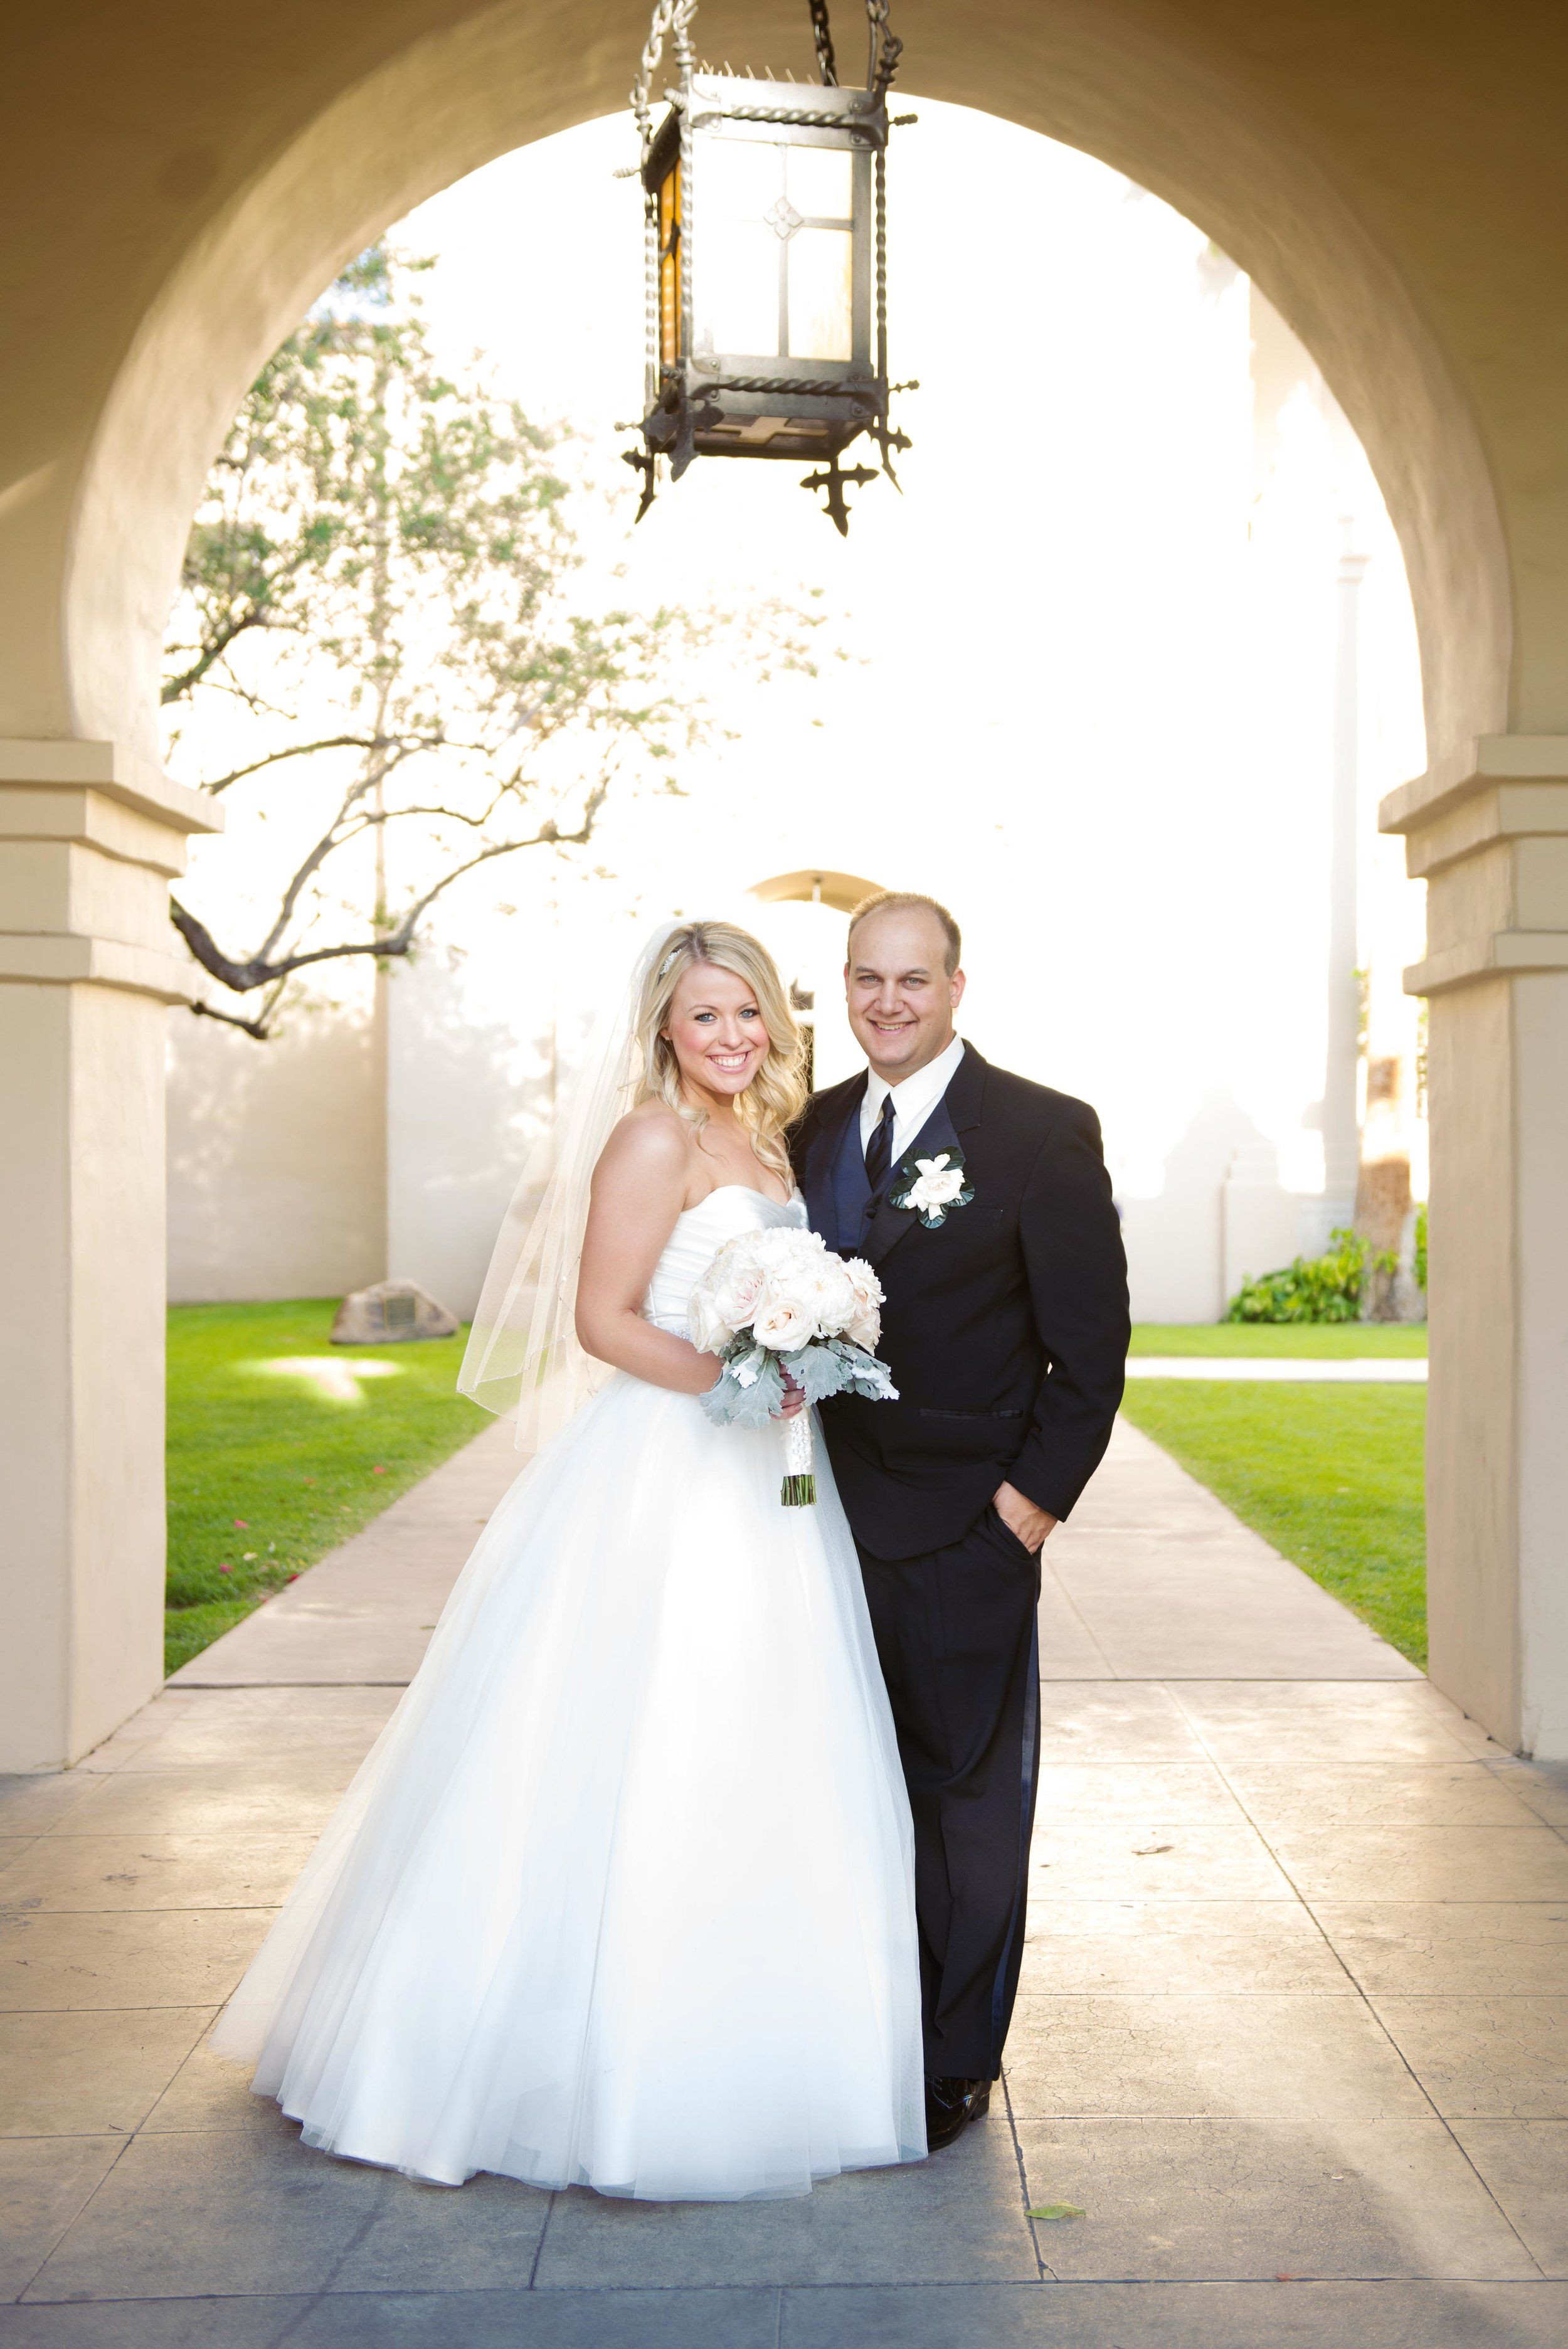 weddingwebsitesmallerpics-55.jpg